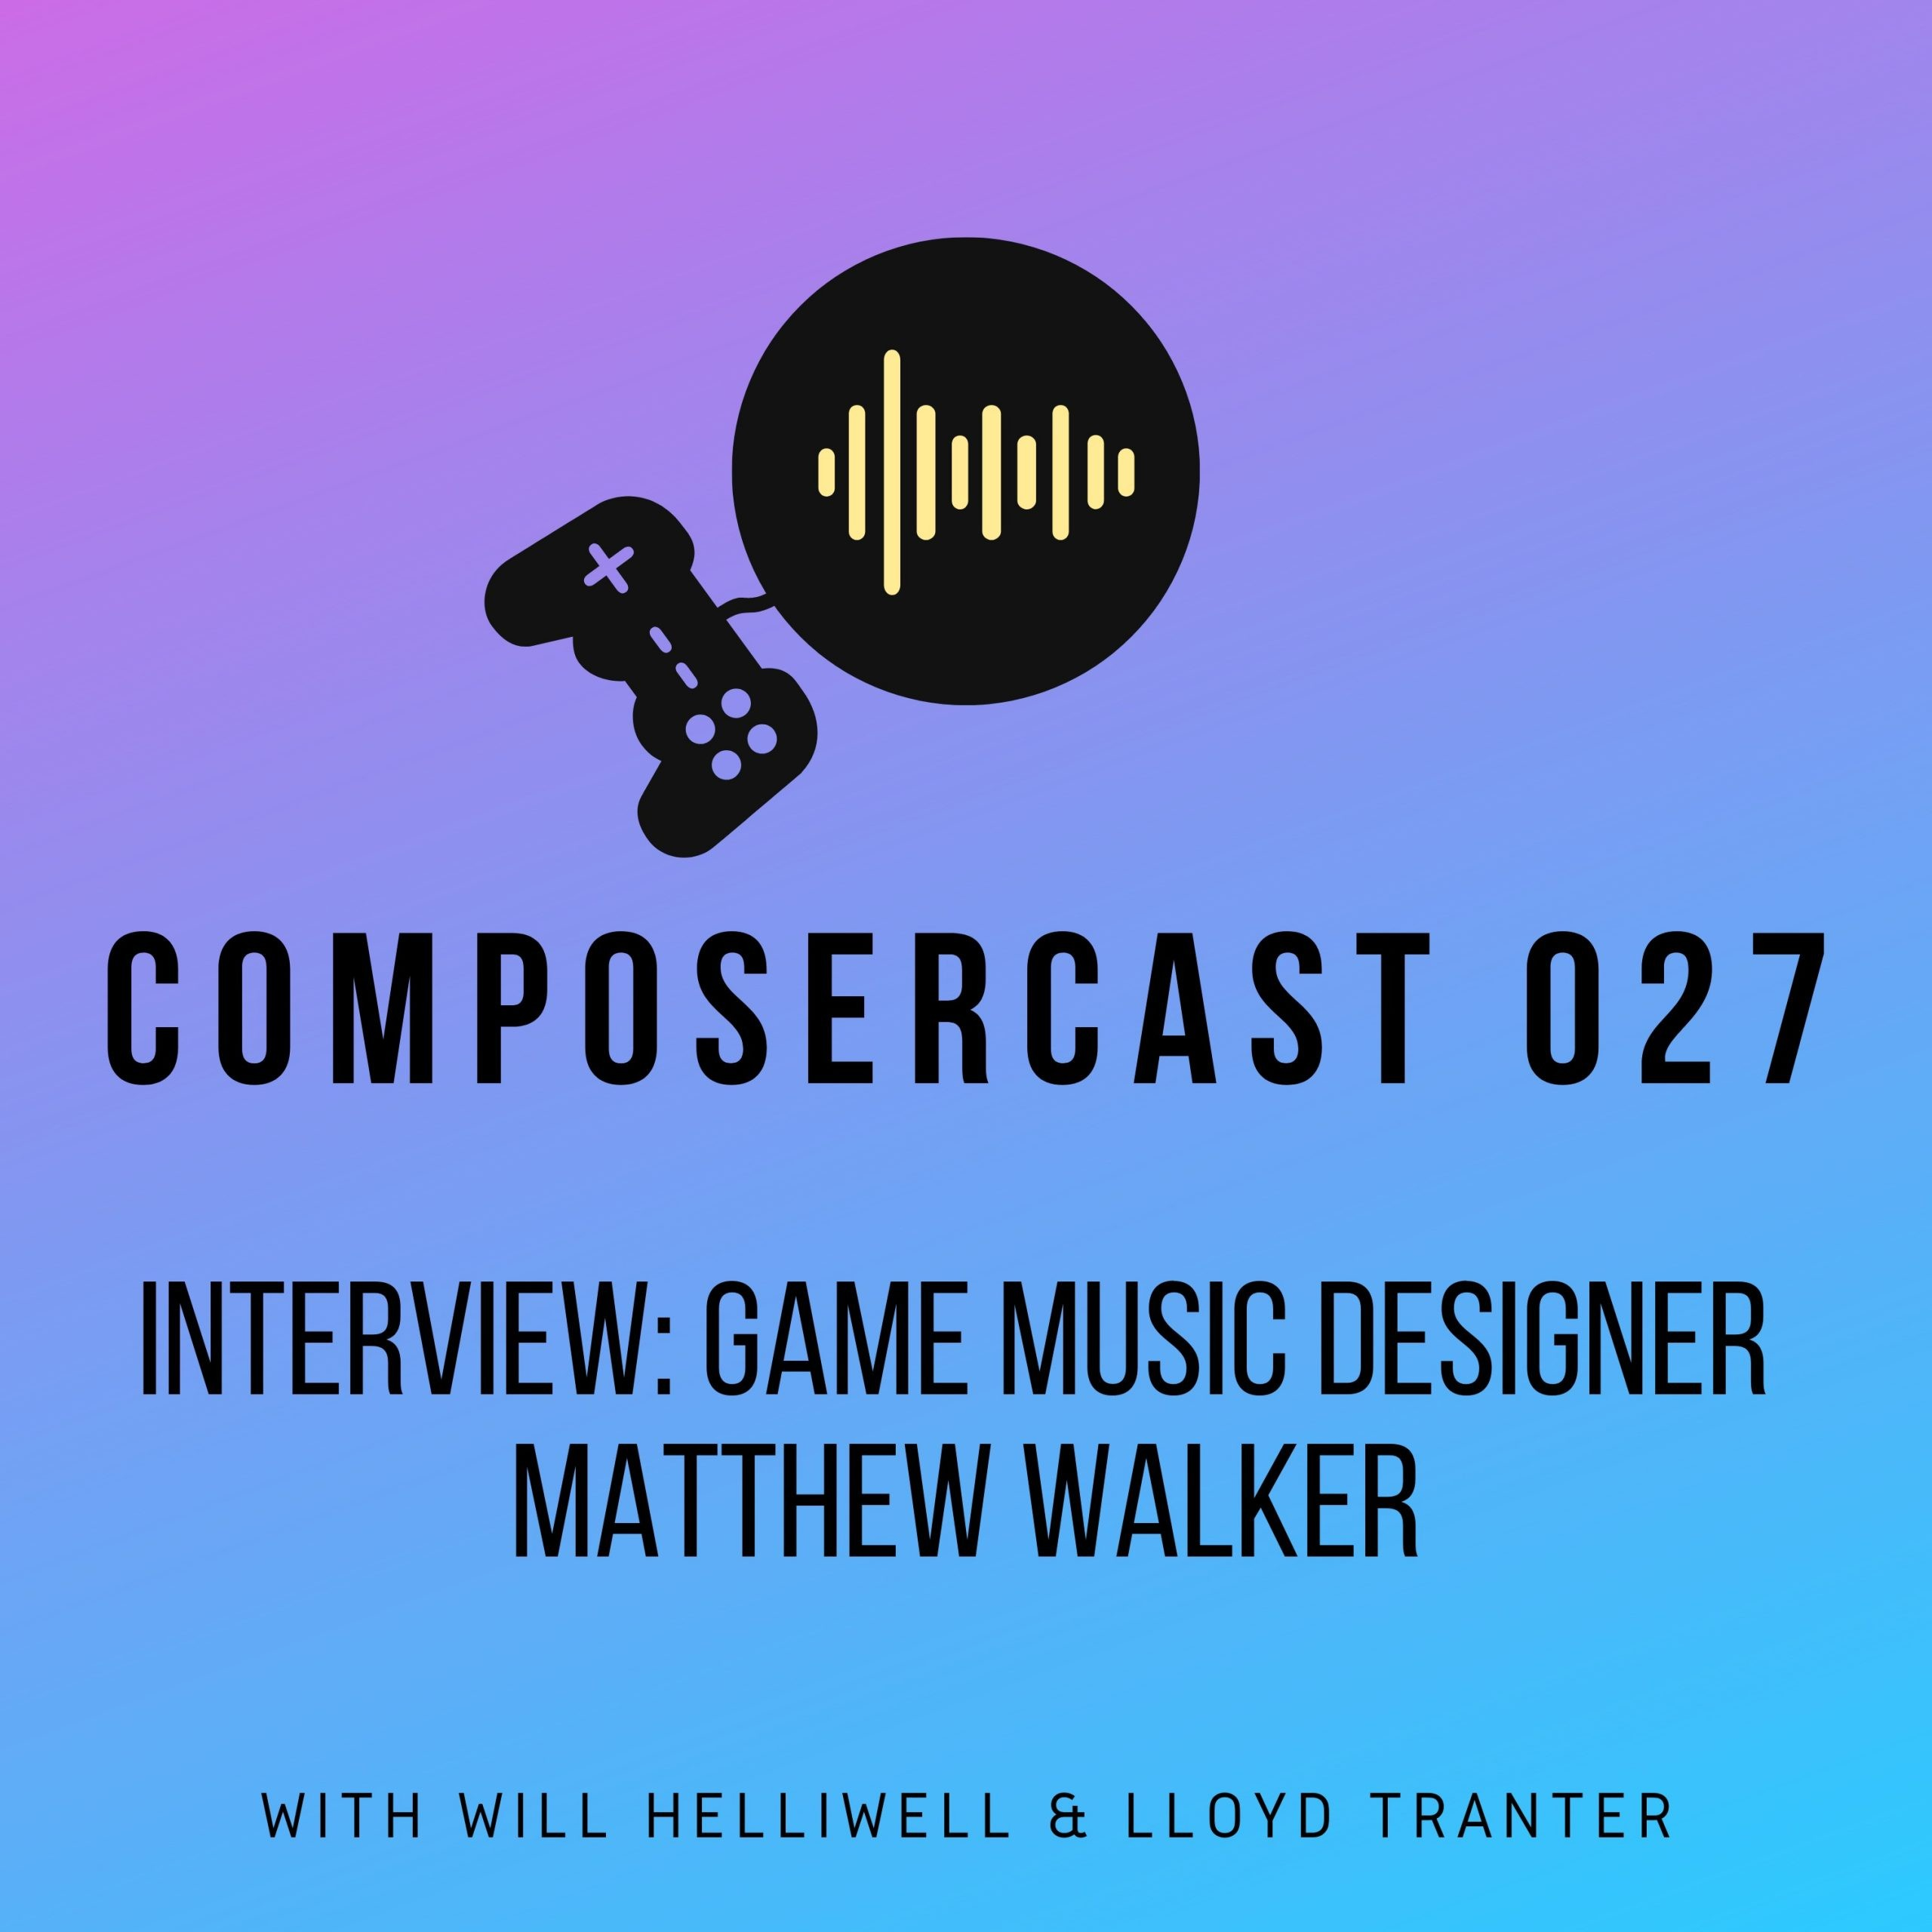 ComposerCast 027 edit1